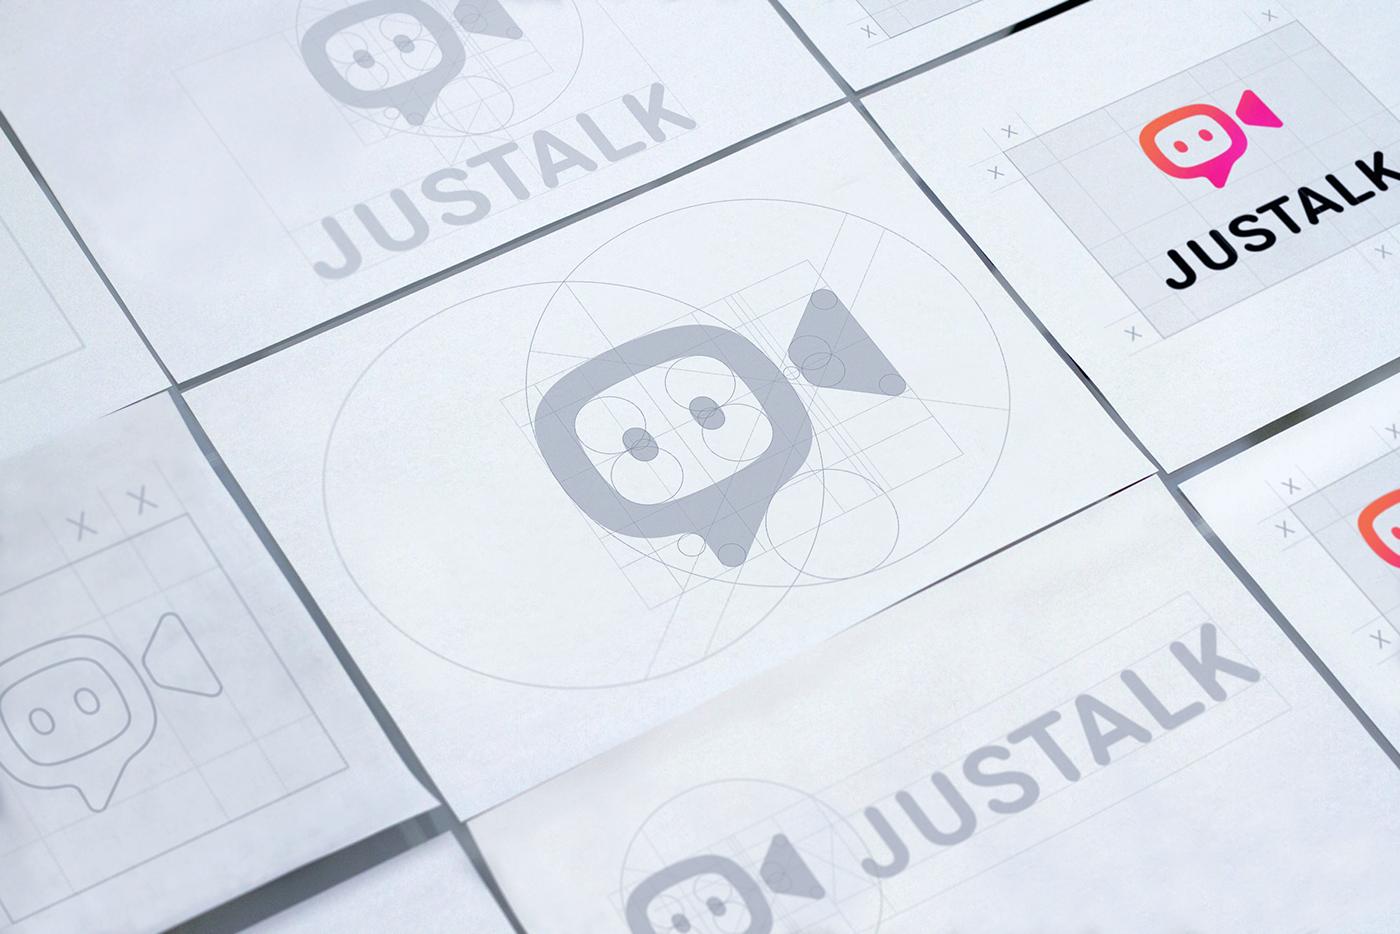 visual identity UX UI Application Design Logo Design brand identity sketches Pictogram Set guideline brandbook